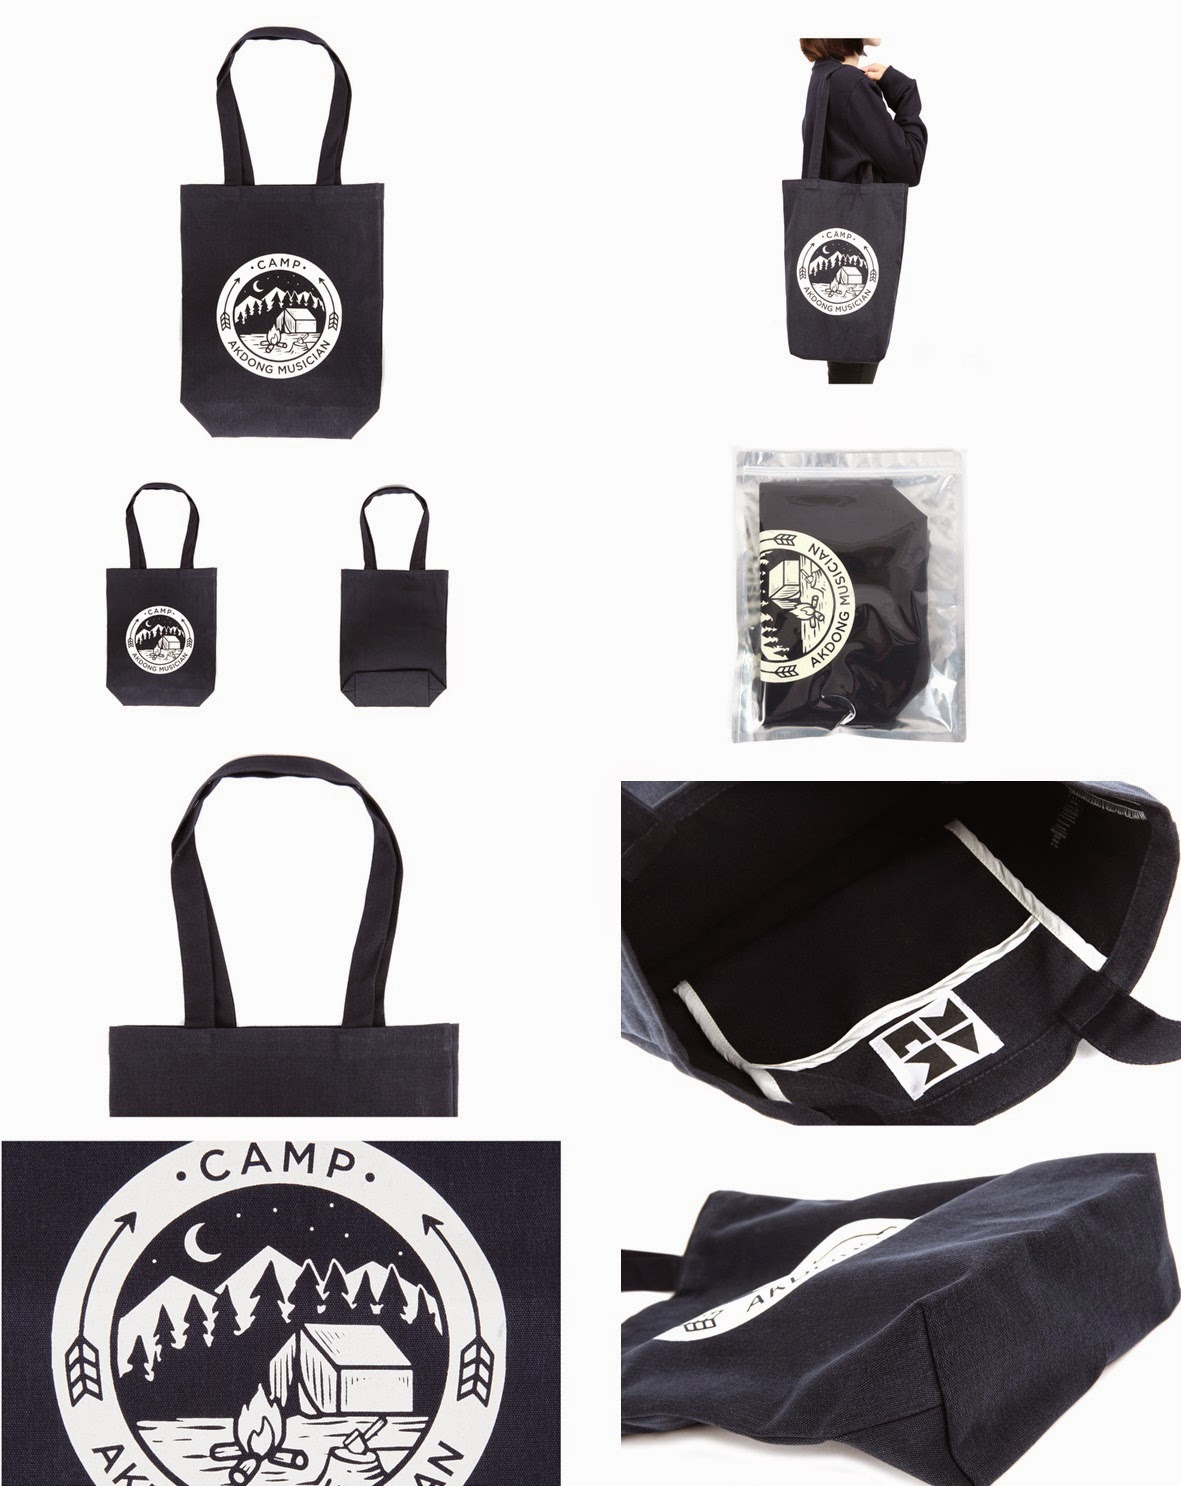 kedai kpop my   out of stock   merchandise  akdong musician - akmu camp official goods